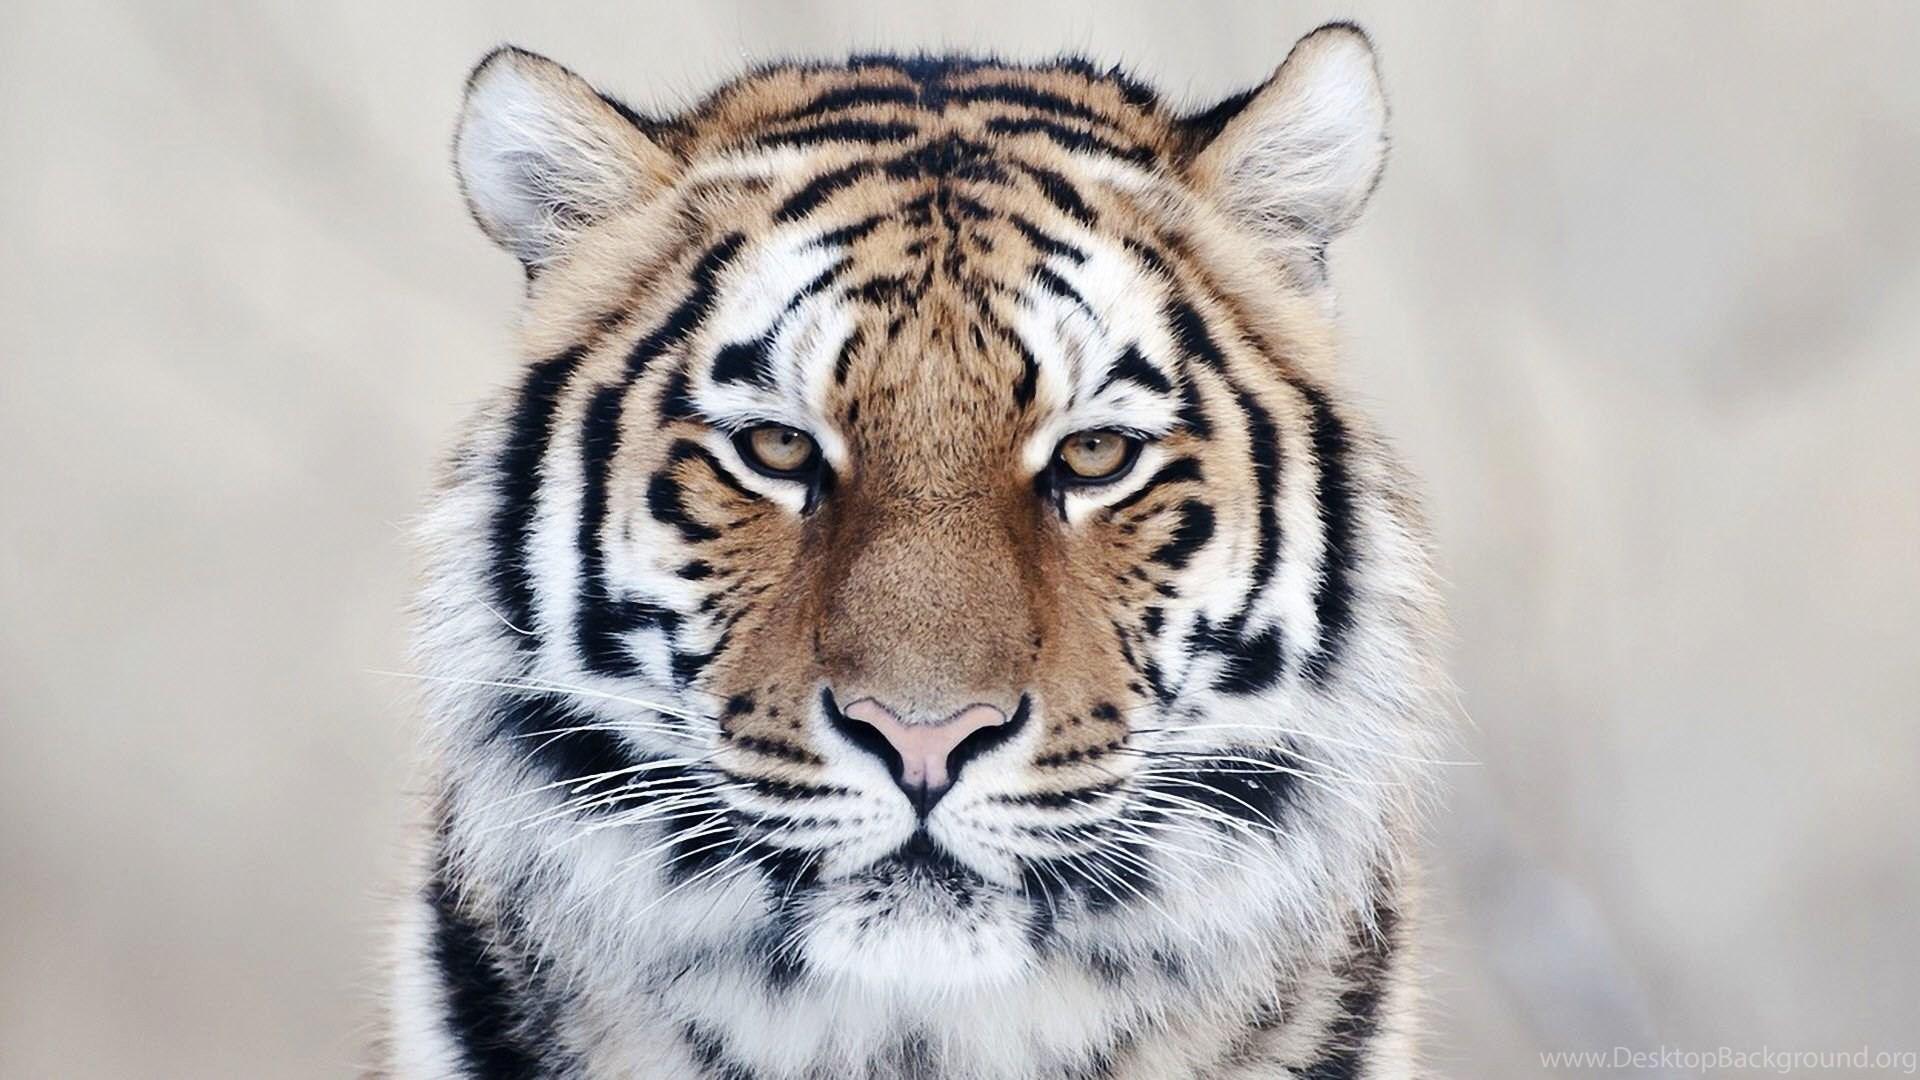 tiger wallpapers hd download desktop background